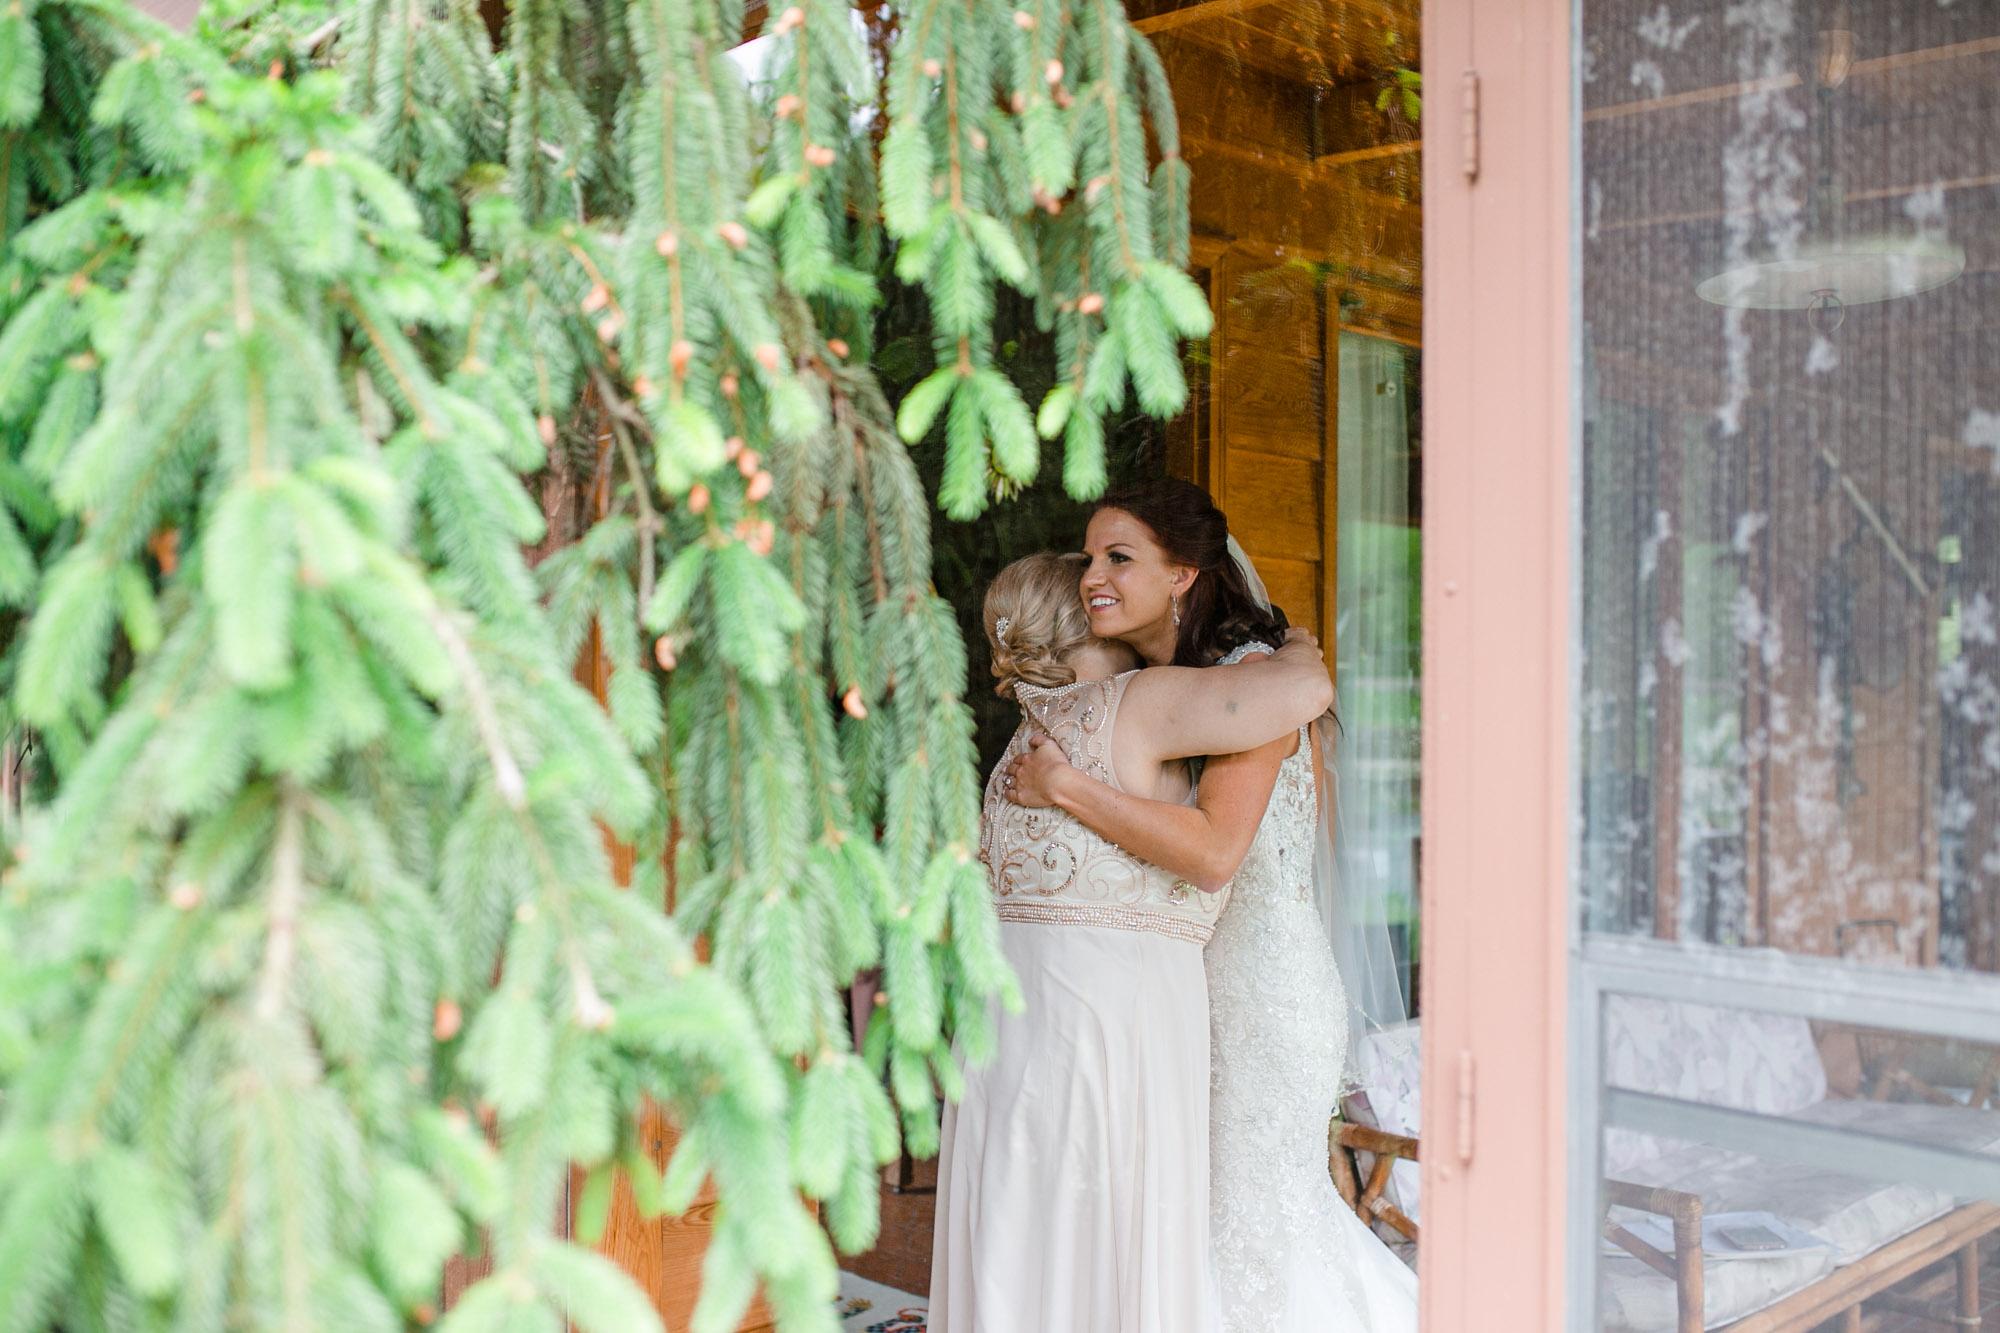 hensville-armory-wedding (3 of 8).jpg